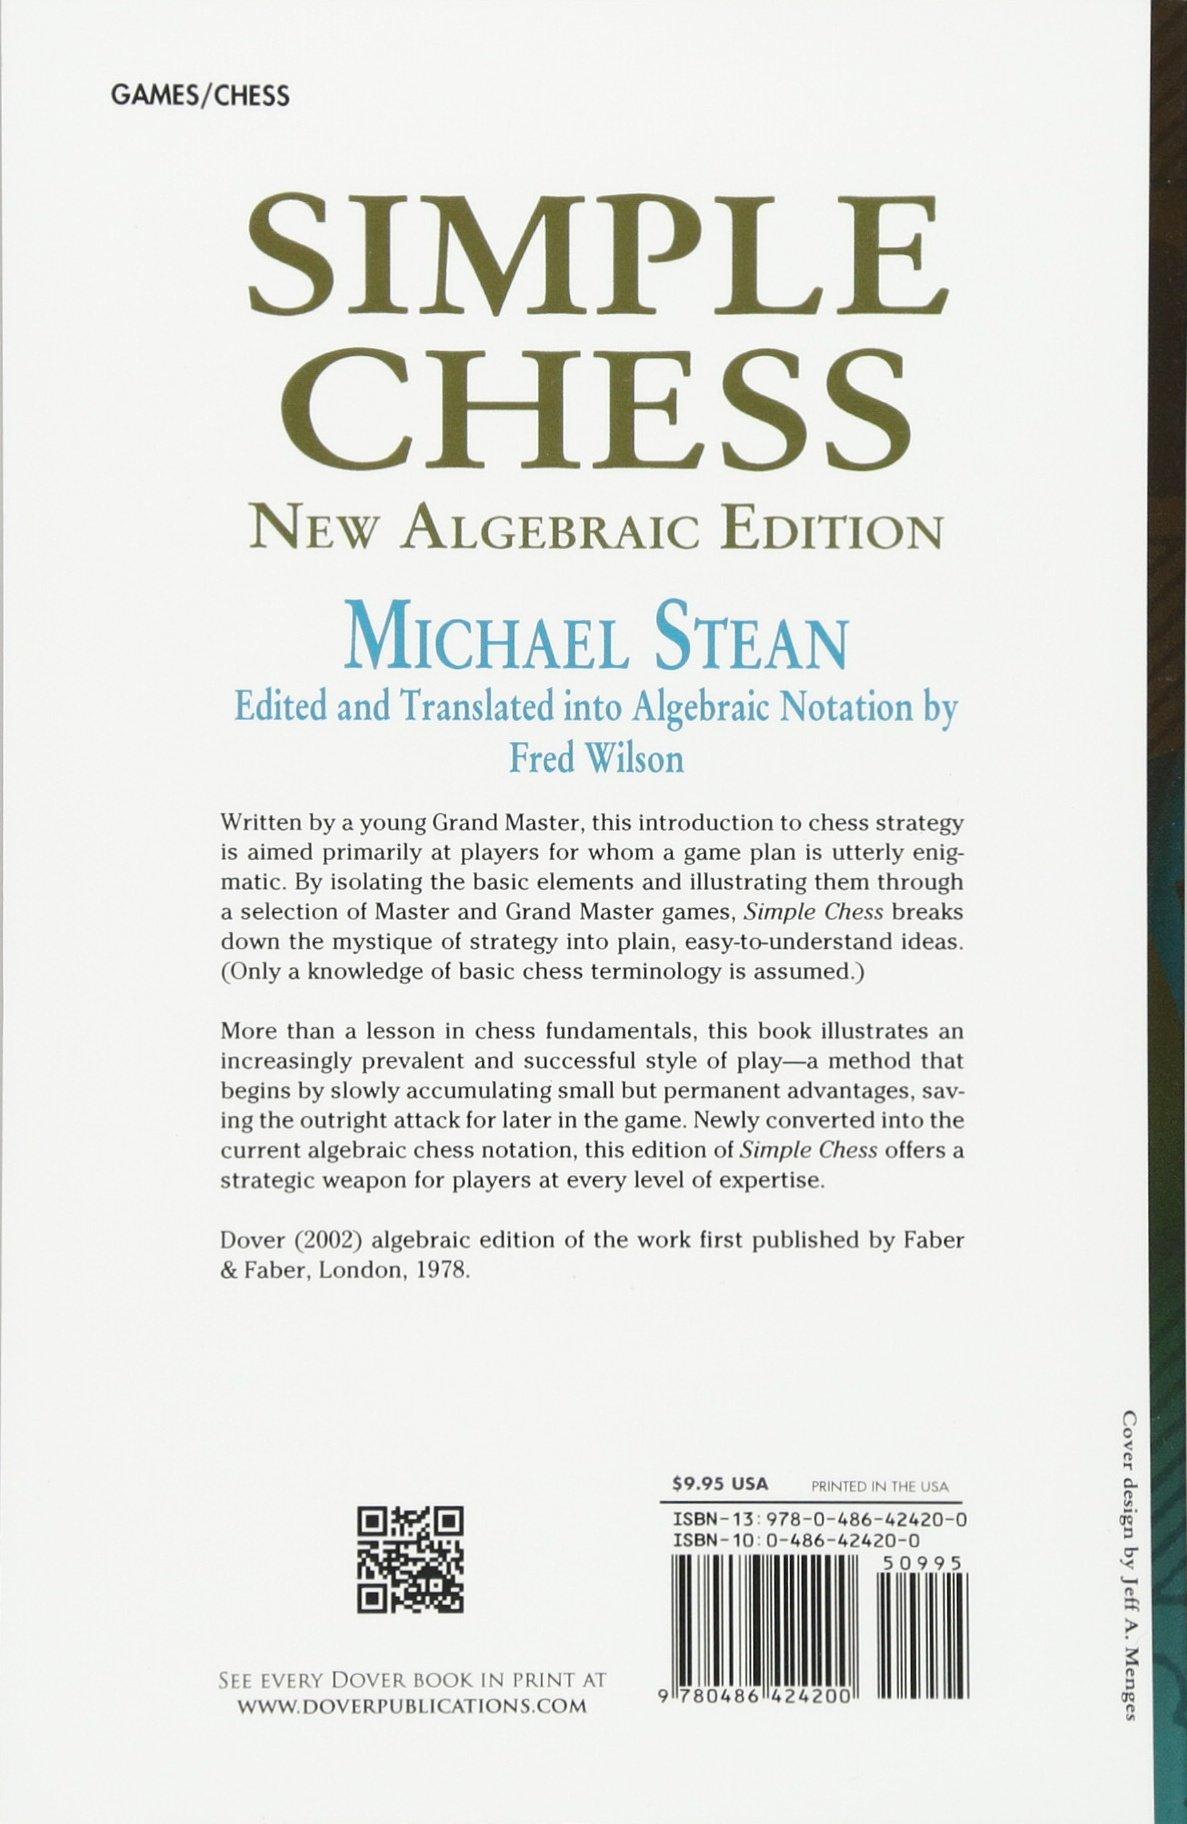 Simple Chess (Dover Chess): Amazon.de: Michael Stean: Fremdsprachige ...